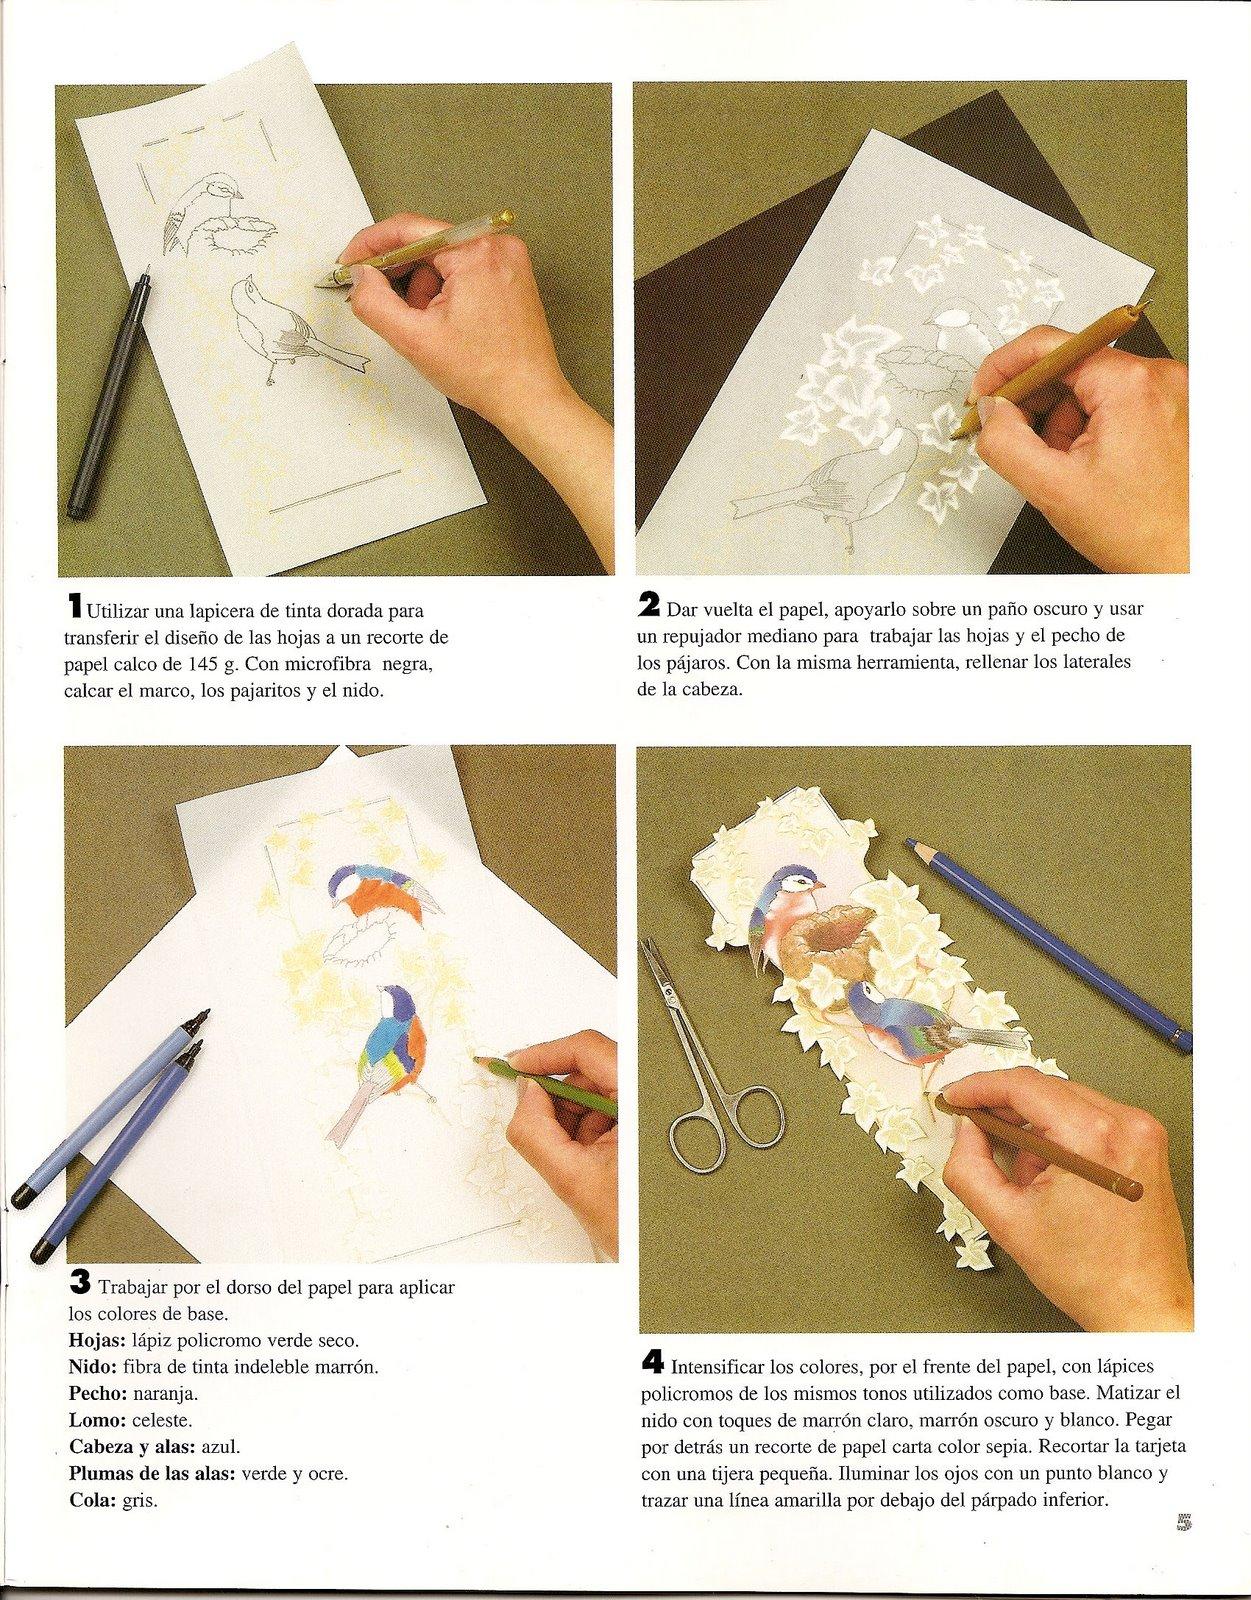 Manualidades para decorar como crear como hacer - Como hacer farolillos de feria ...